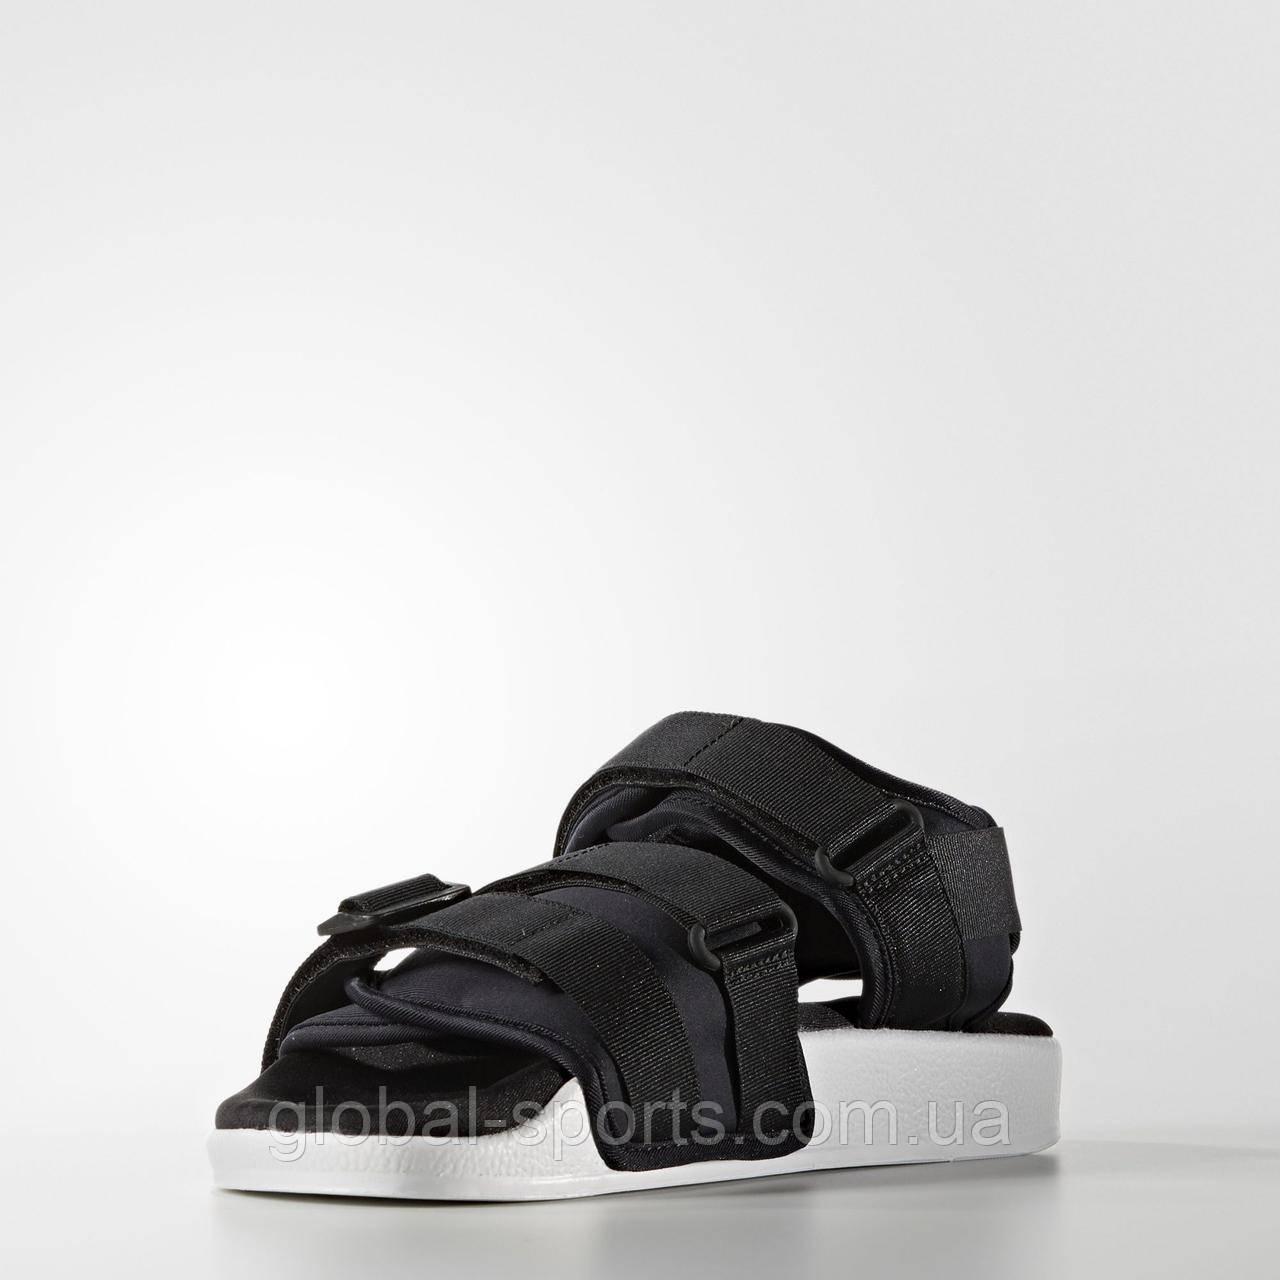 Женские сандалии Adidas Originals adilette(Артикул S75382)  продажа ... b169a2c866710